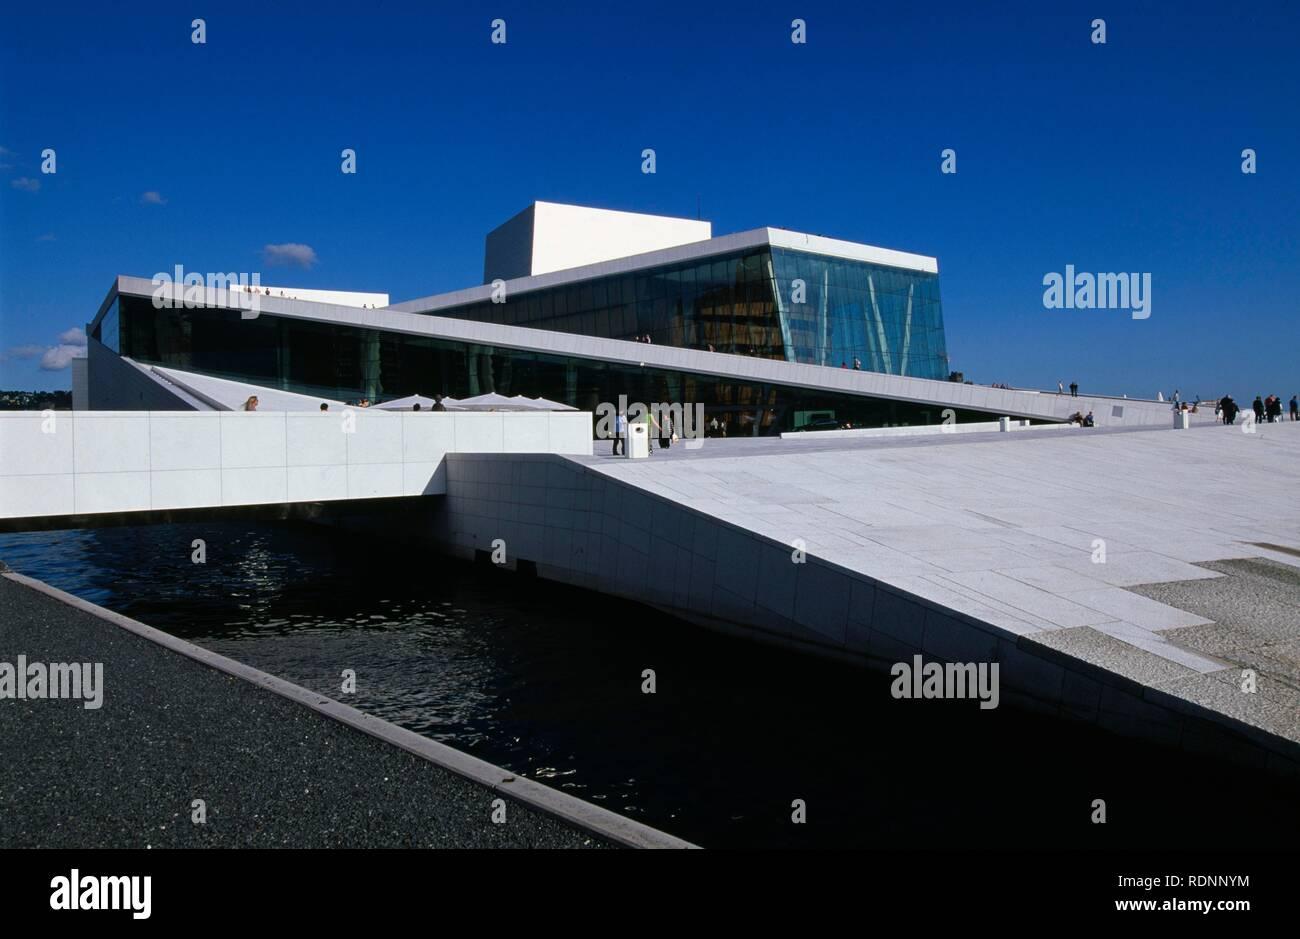 Operahuset opera house, built by the Snrhetta architect's office in the Bjørvika Sund, Oslo, Norway, Europe - Stock Image